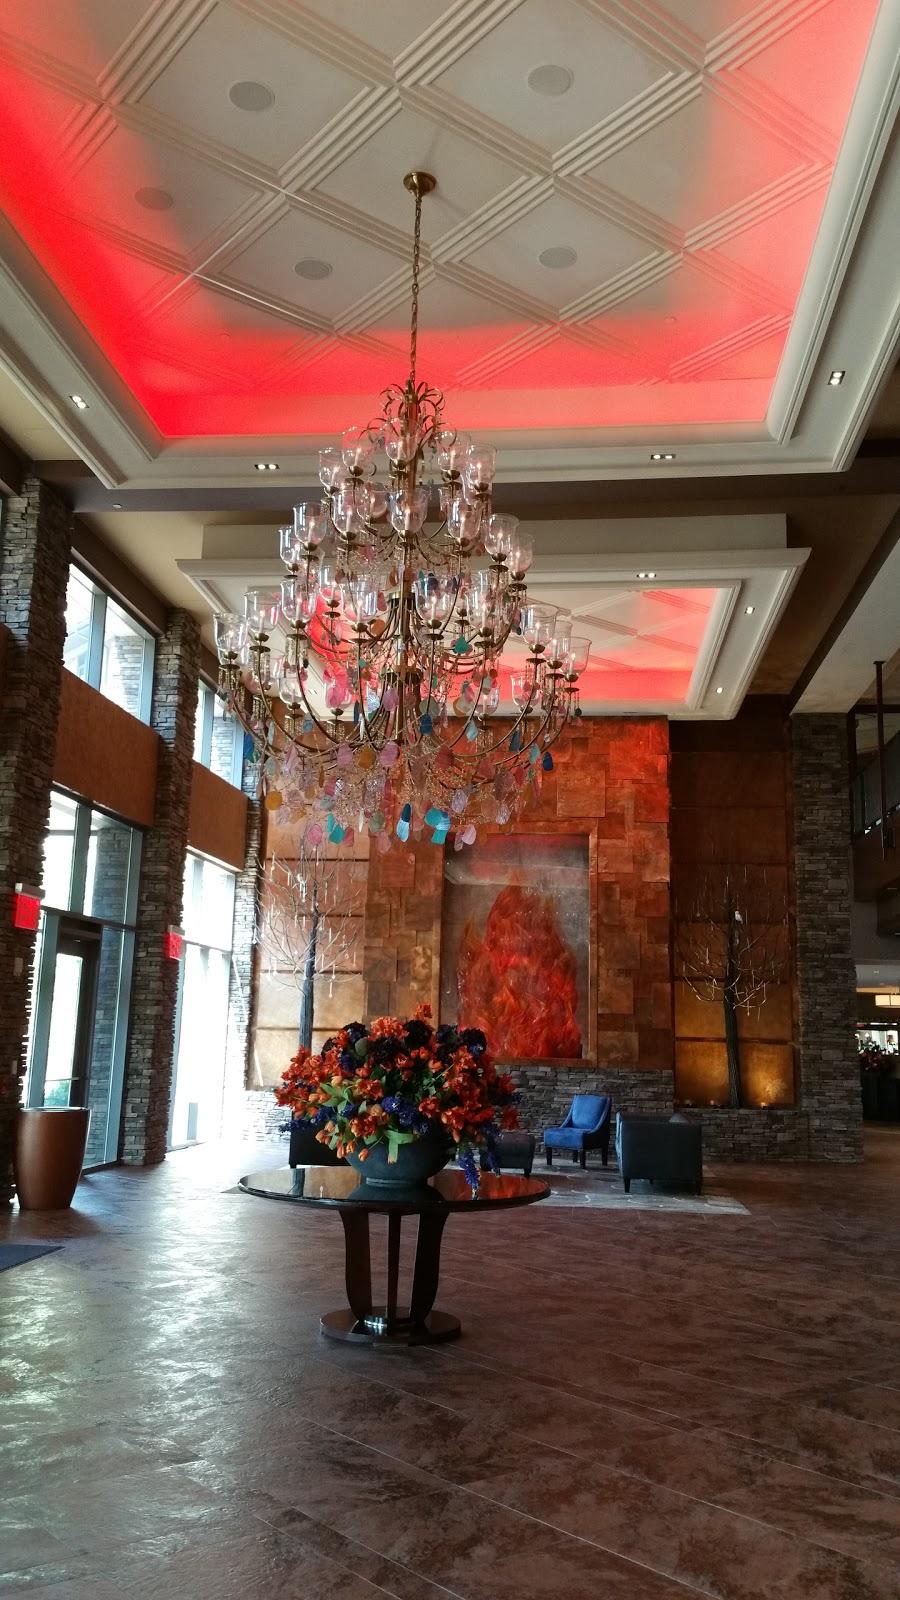 Mount Airy Casino Resort - lodging    Photo 7 of 10   Address: 312 Woodland Rd, Mt Pocono, PA 18344, USA   Phone: (877) 682-4791